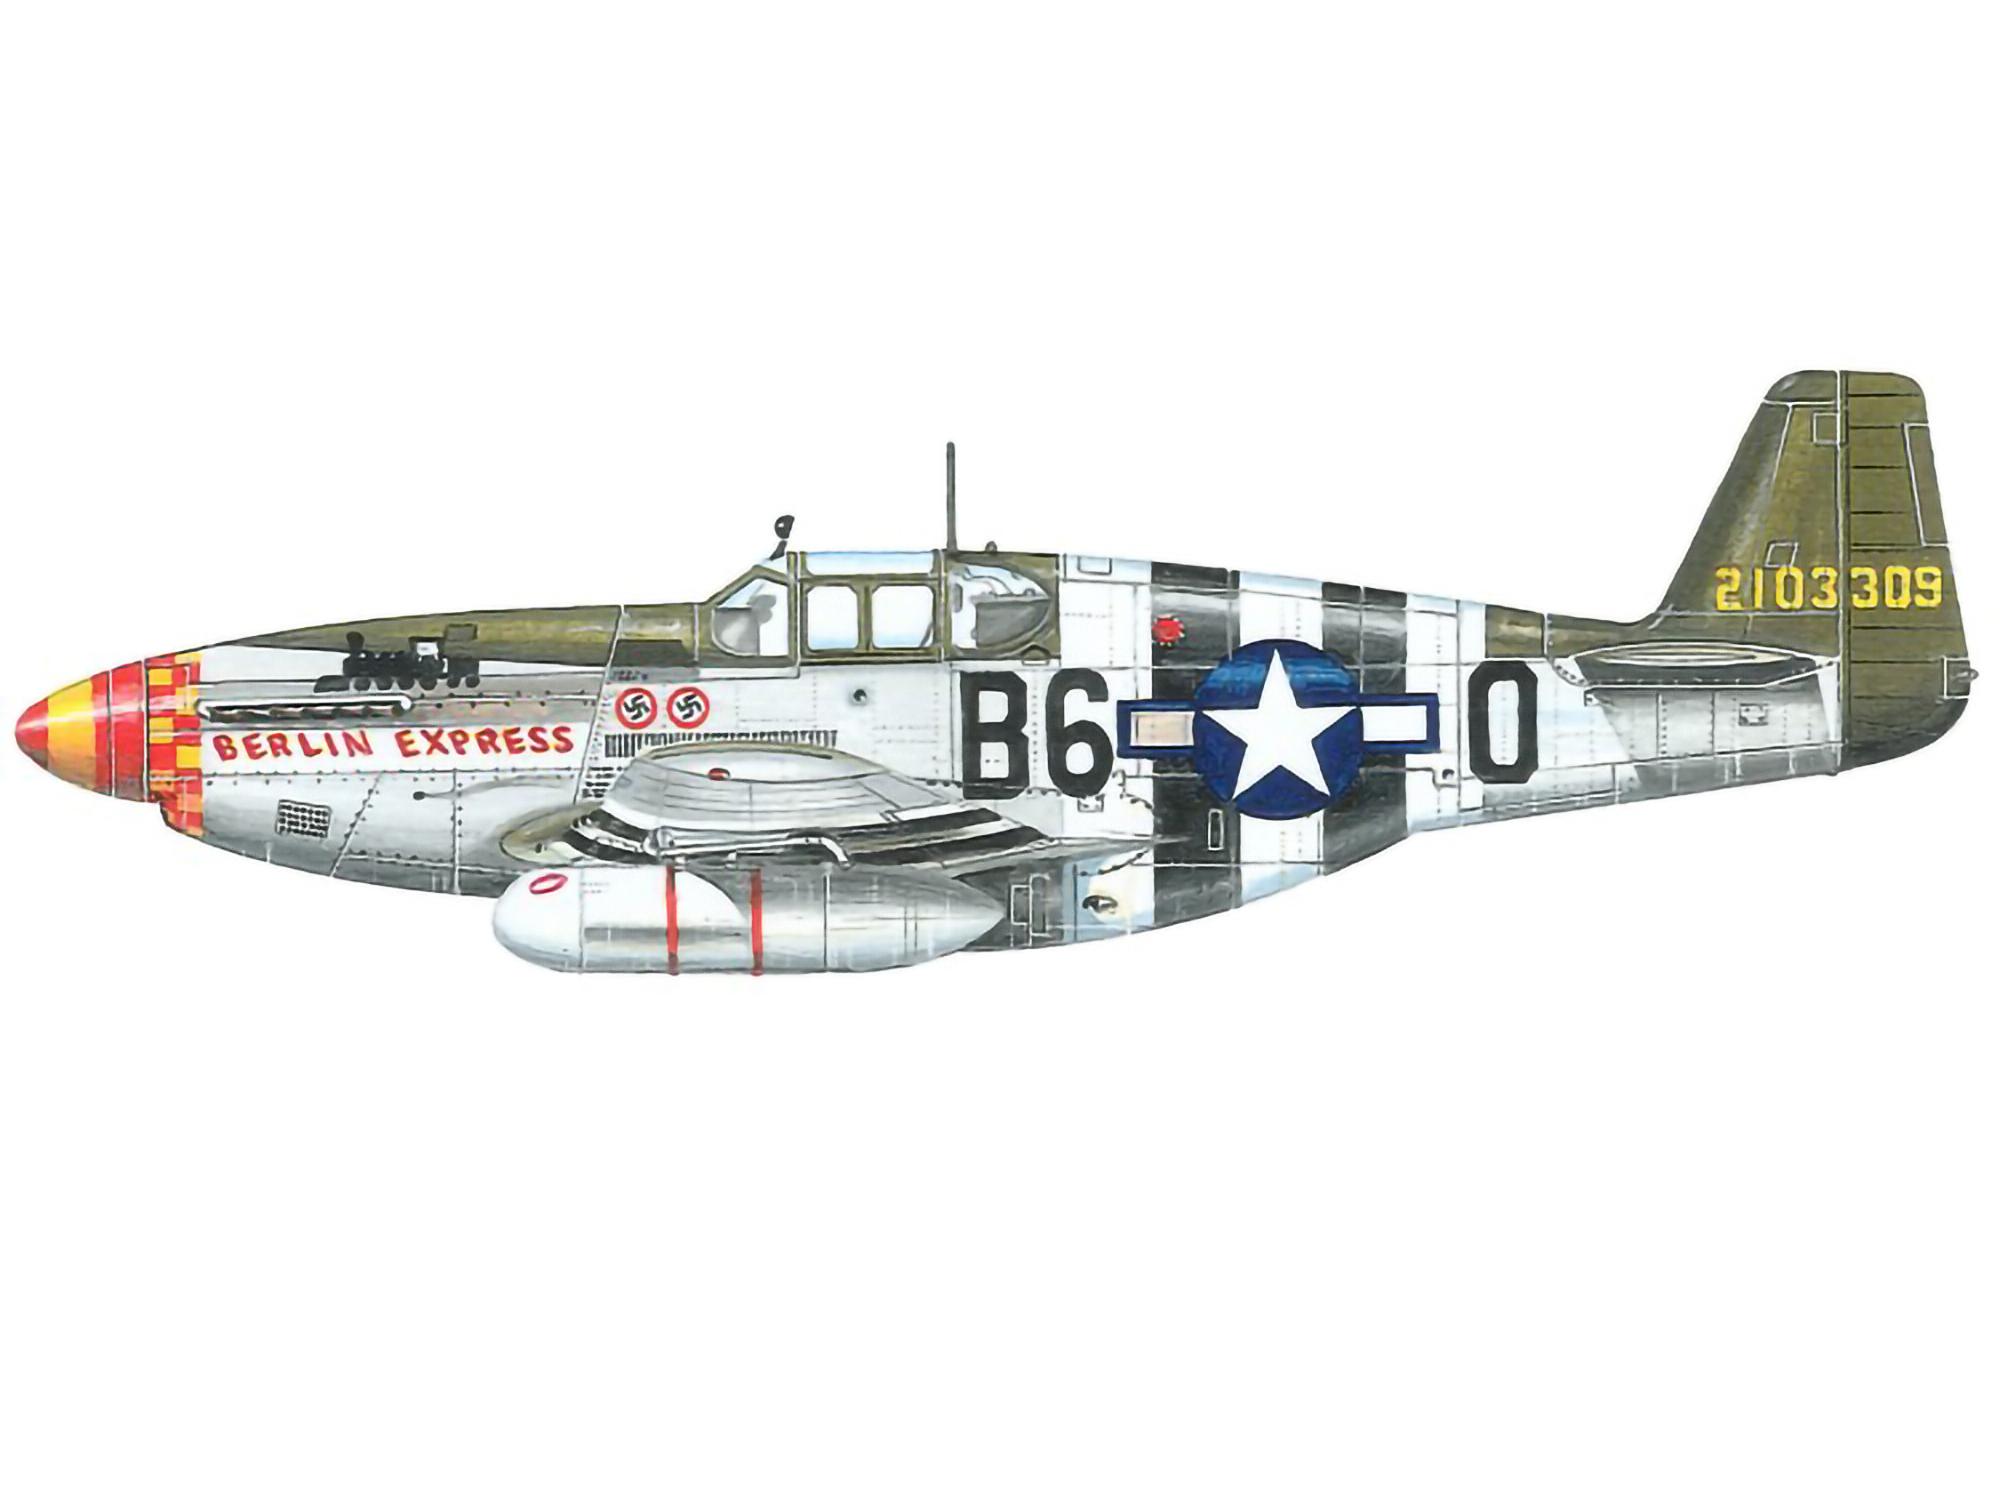 P-51C – Berlin Express – 42-103309